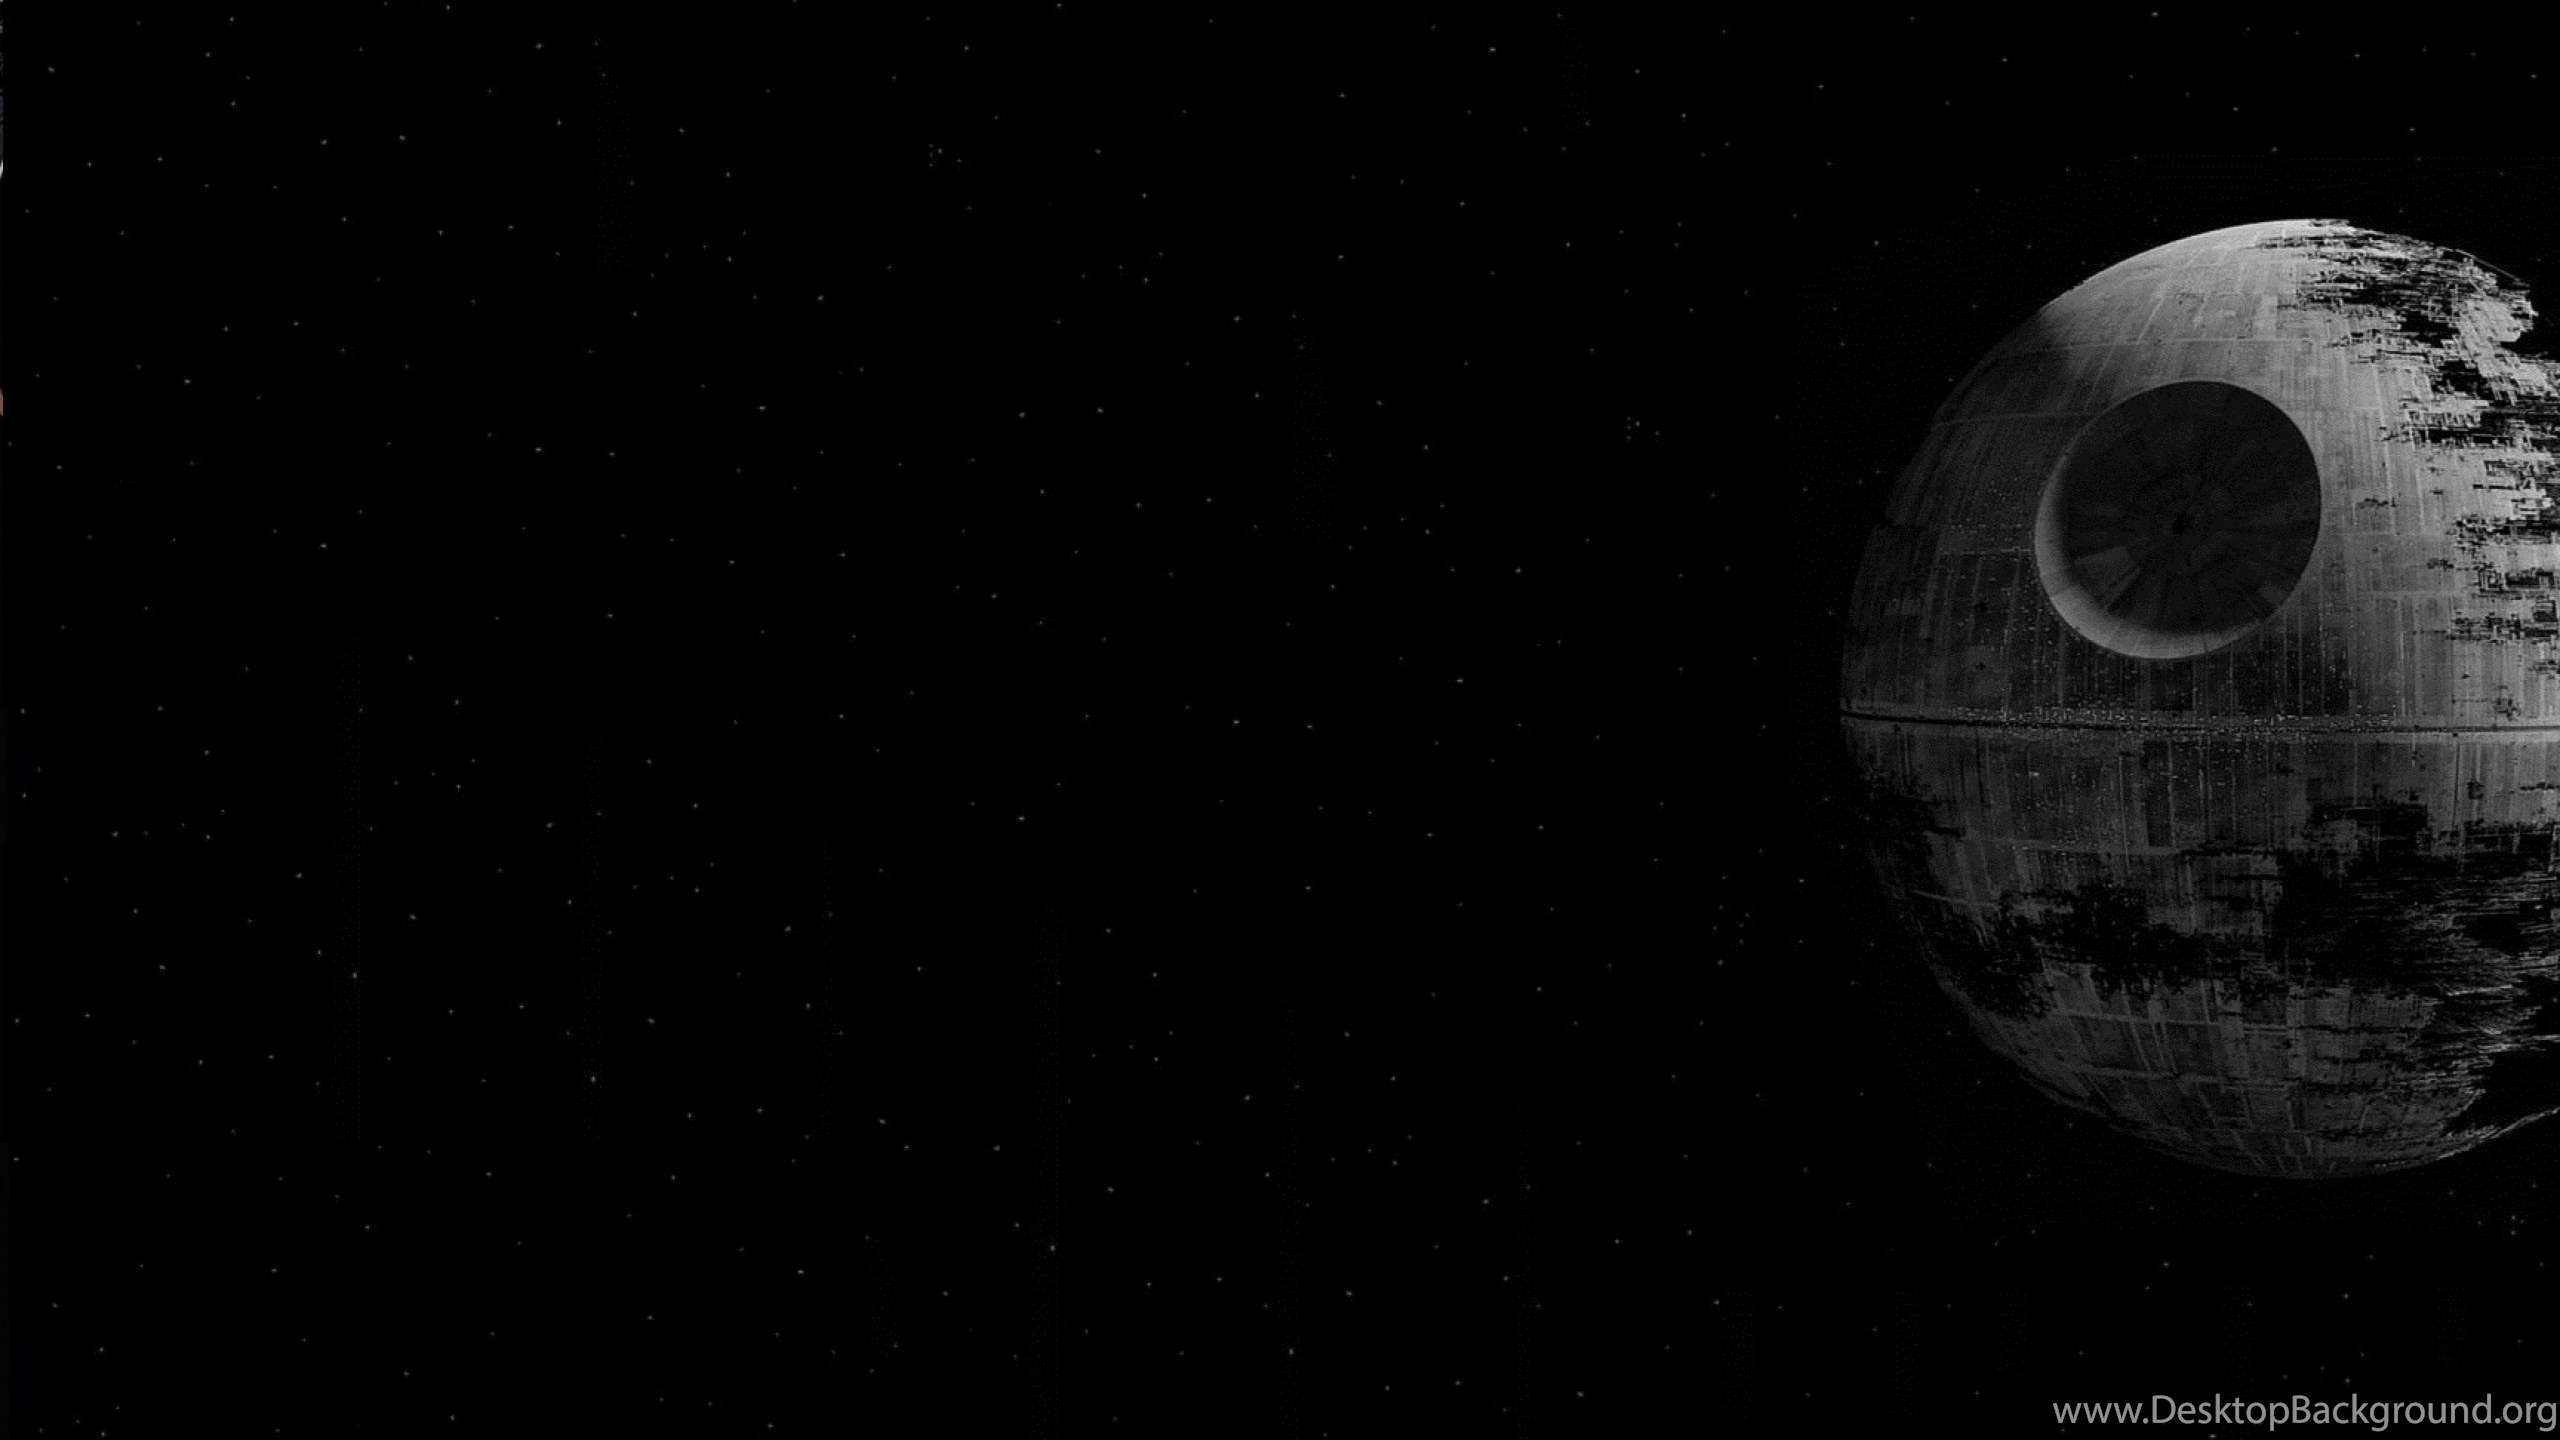 Wallpapers Death Star Wars Movies Black X High 2560x1600 Desktop Background